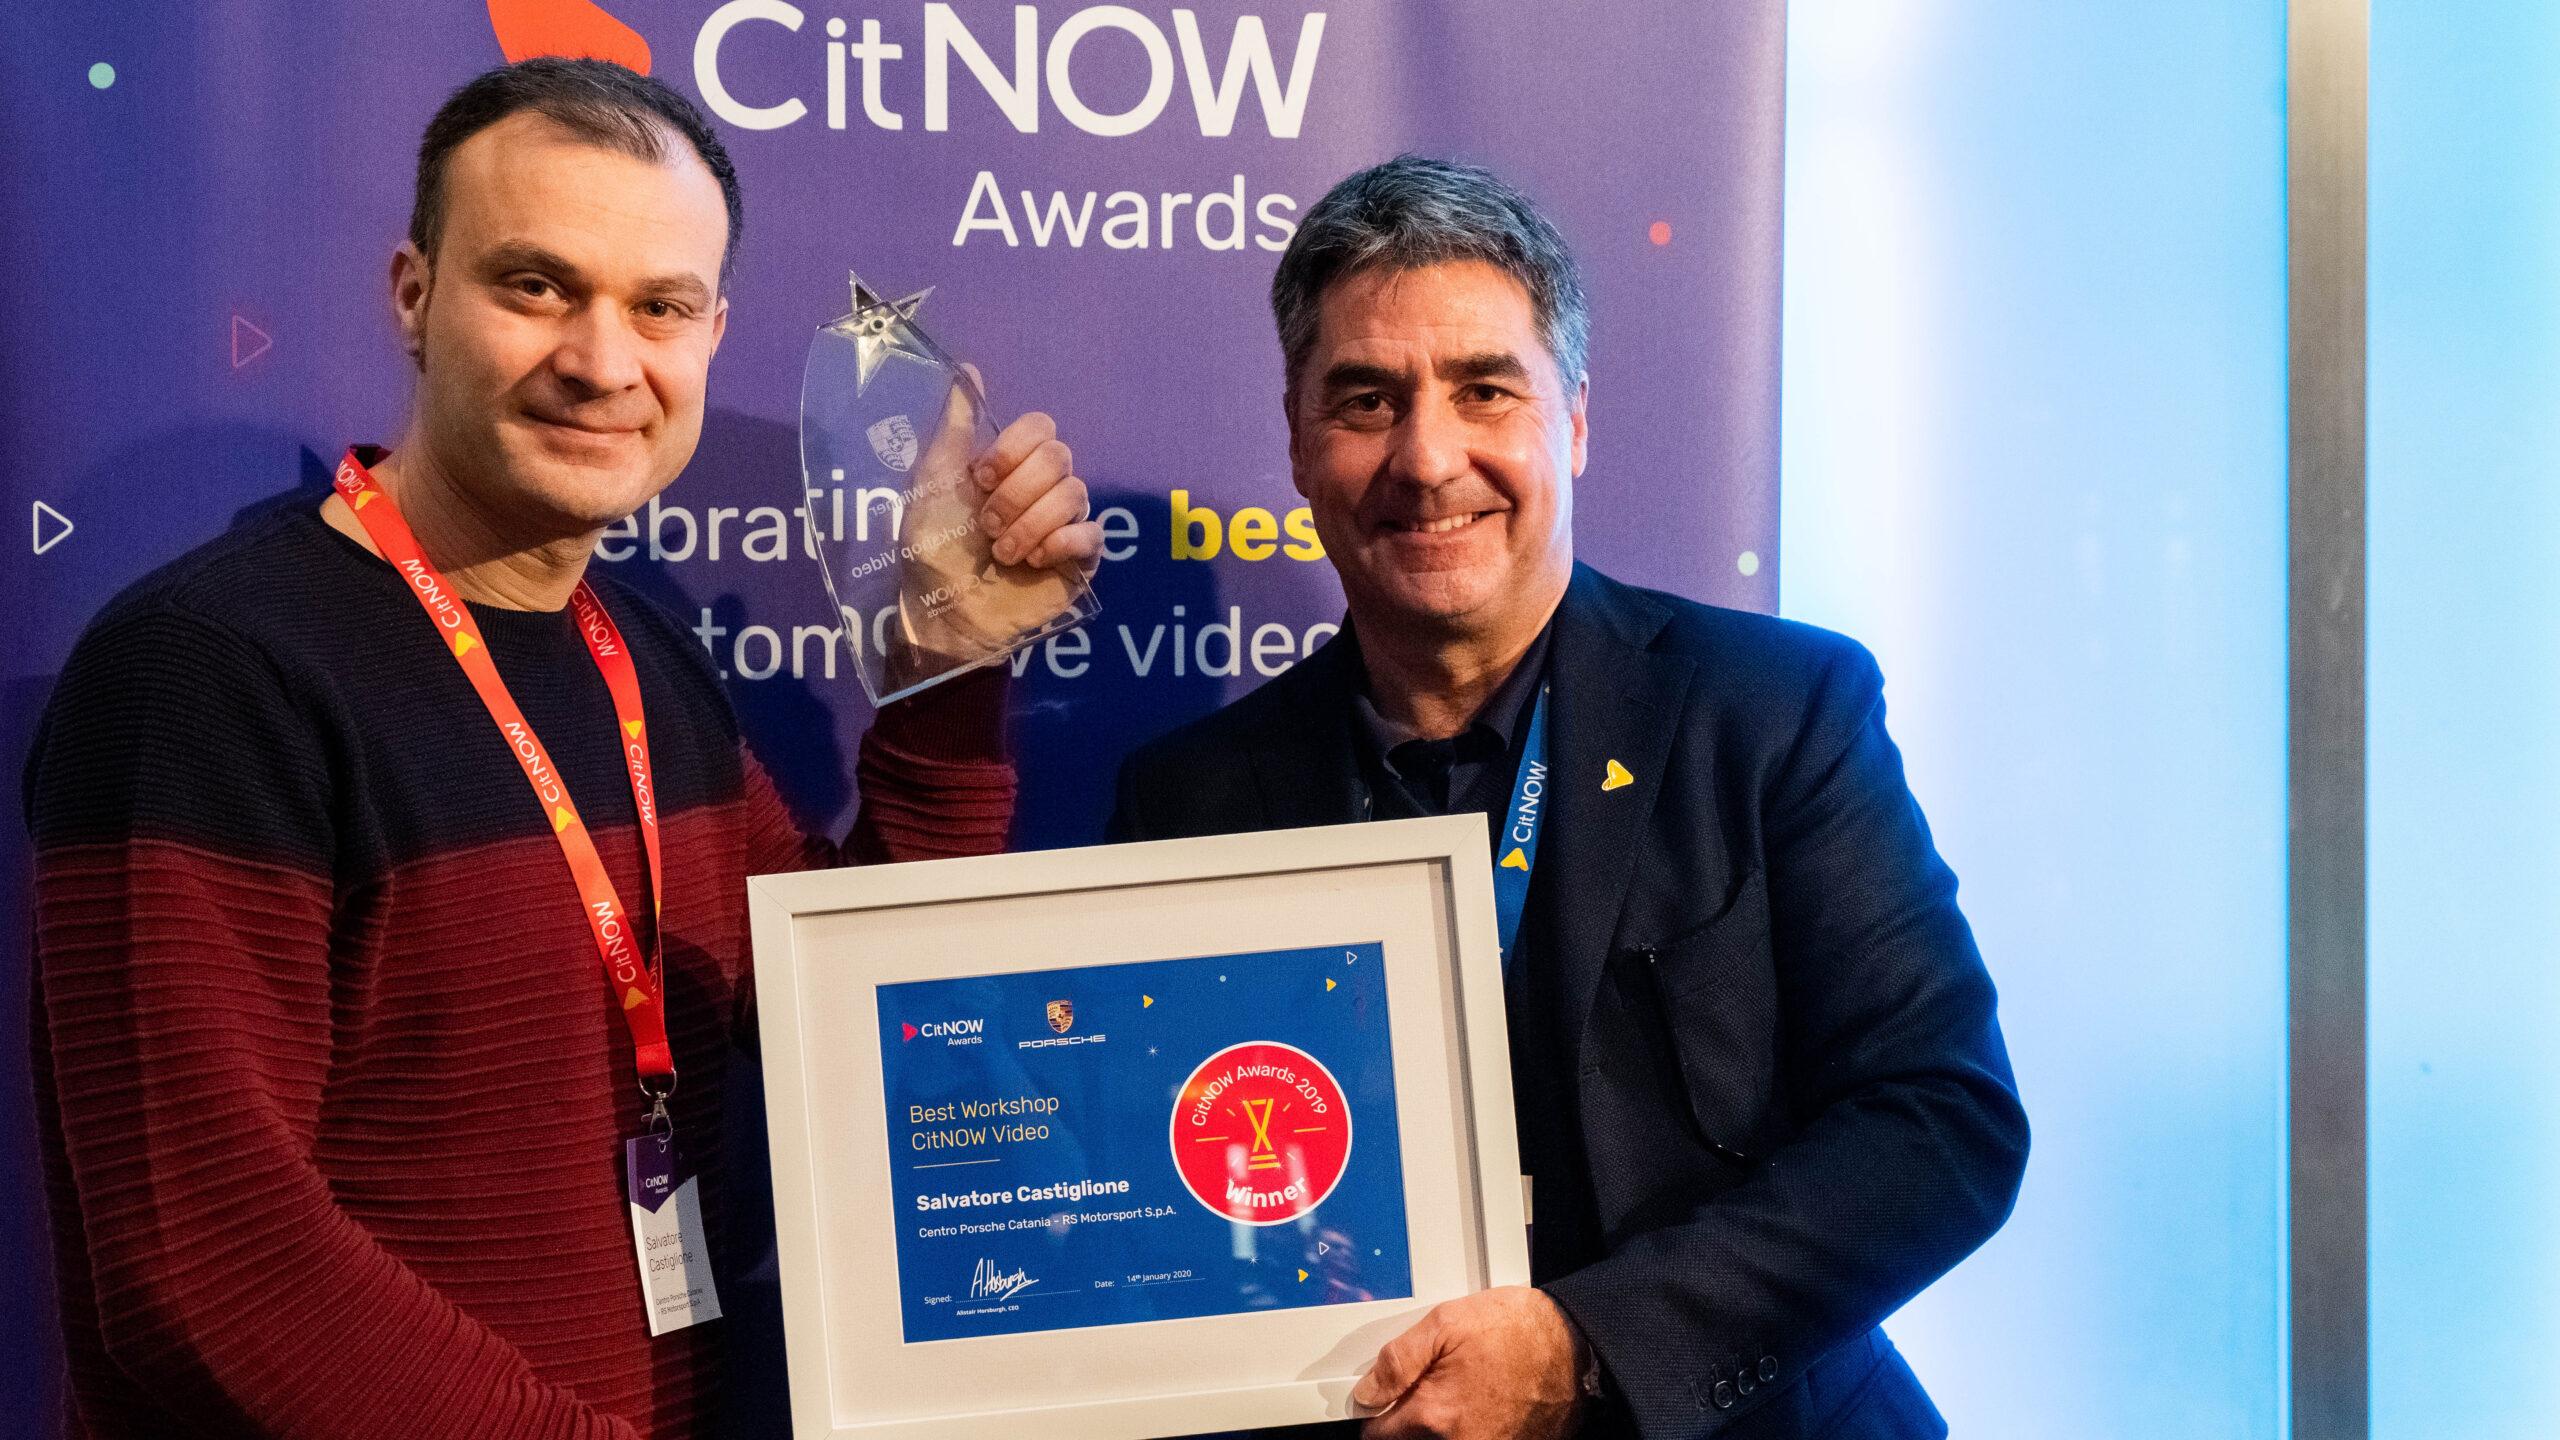 Salvatore Castigilione, Best Workshop CitNOW